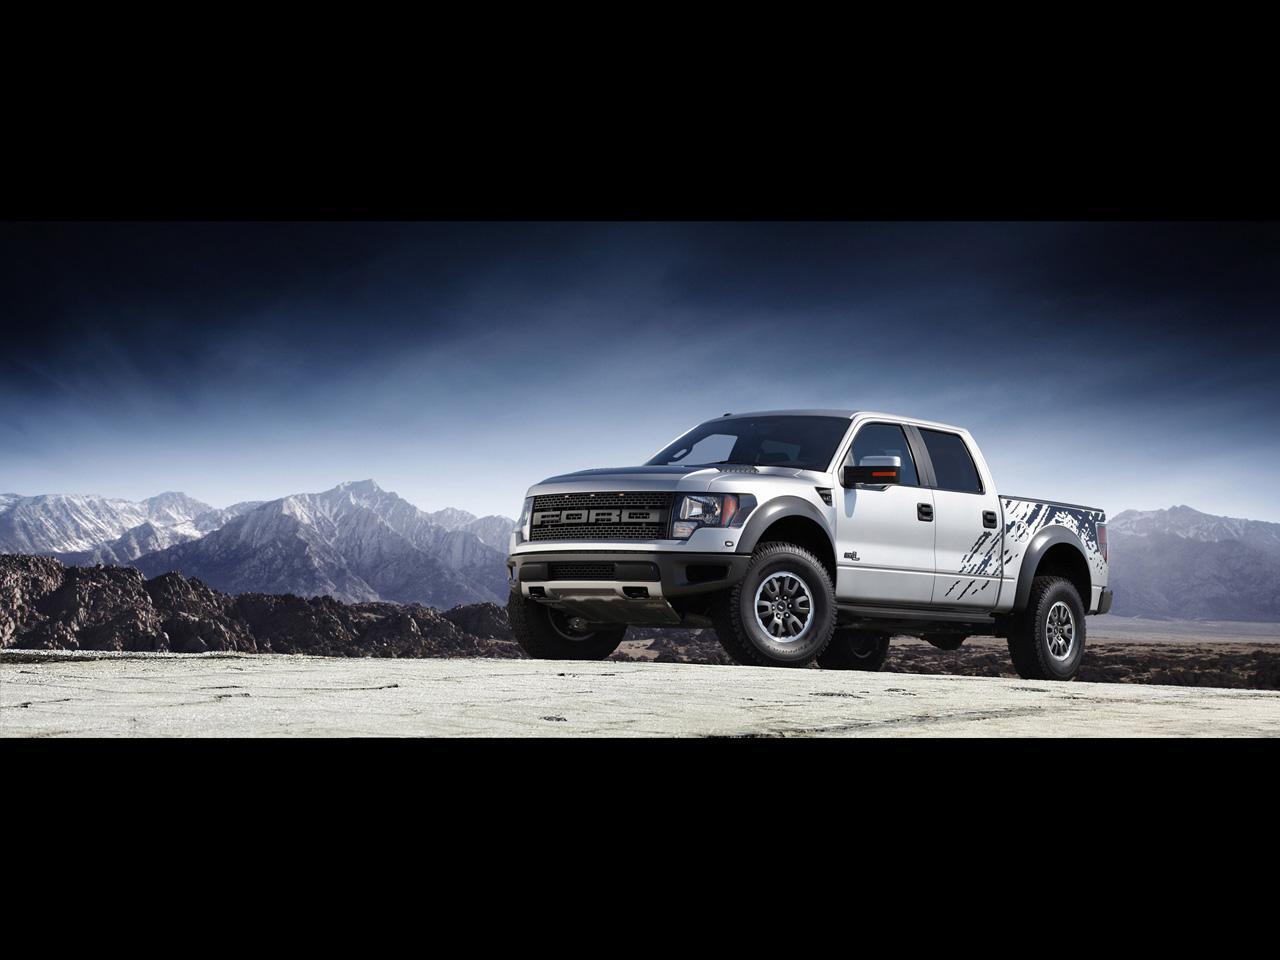 2011 Ford F 150 SVT Raptor Wallpapers Widescreen Desktop Backgrounds 1280x960